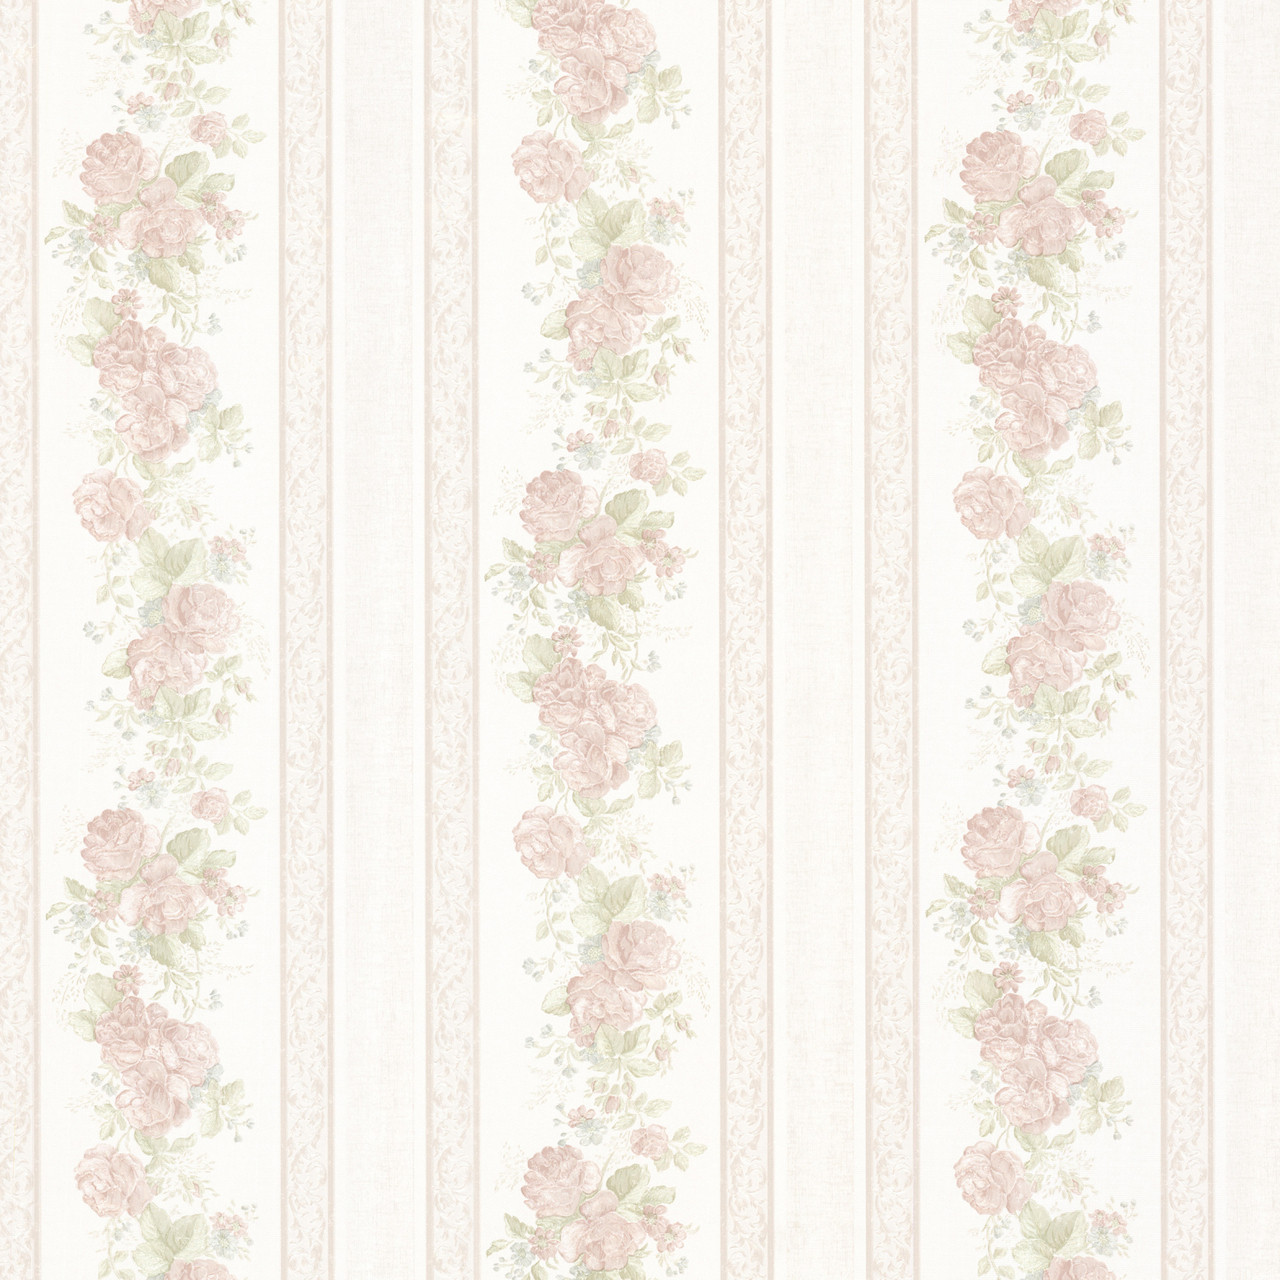 992 68317 Tasha Pastel Satin Floral Scroll Stripe Wallpaper